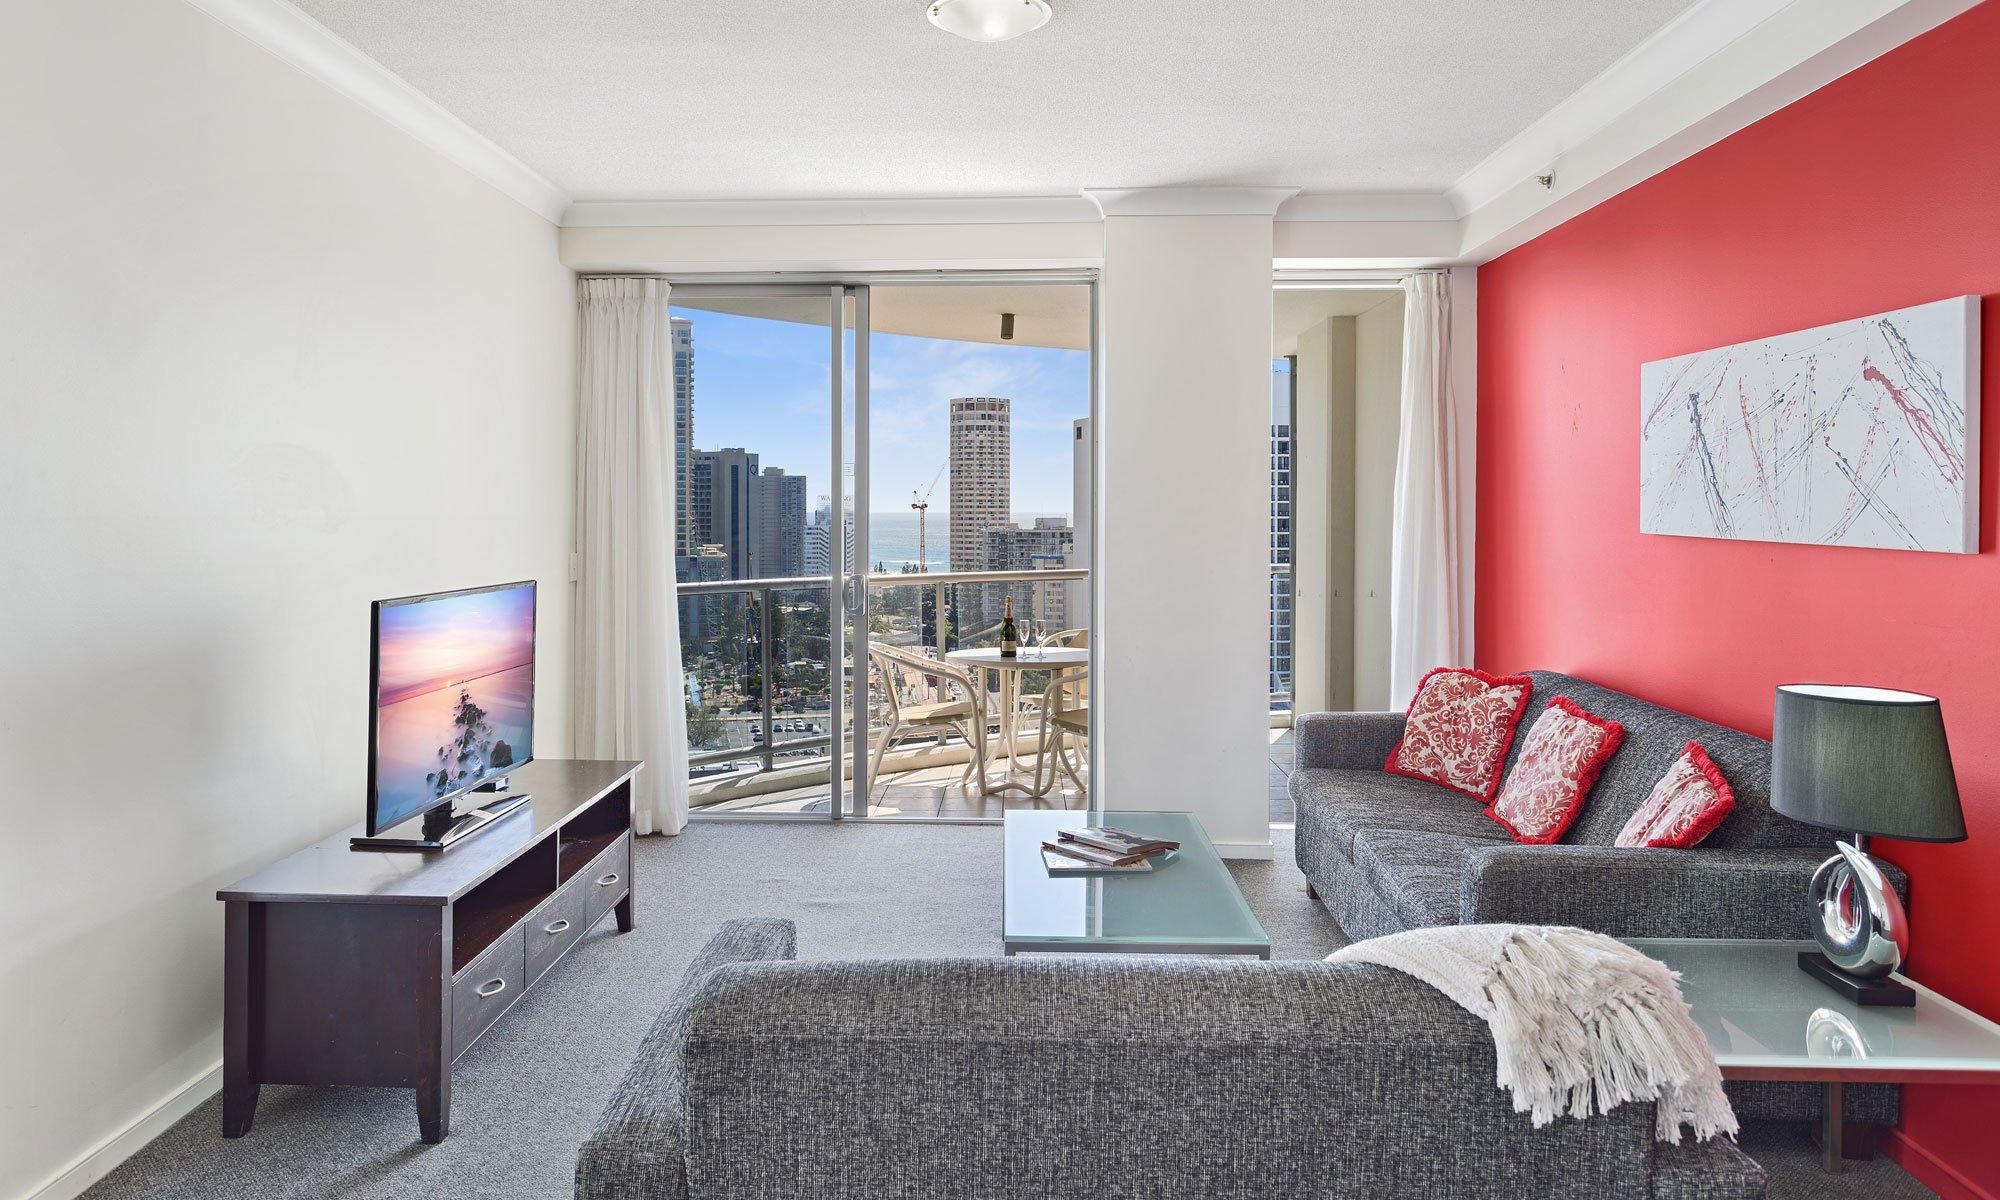 Gold Coast real estate for sale Chevron Renaissance 1171 large living room